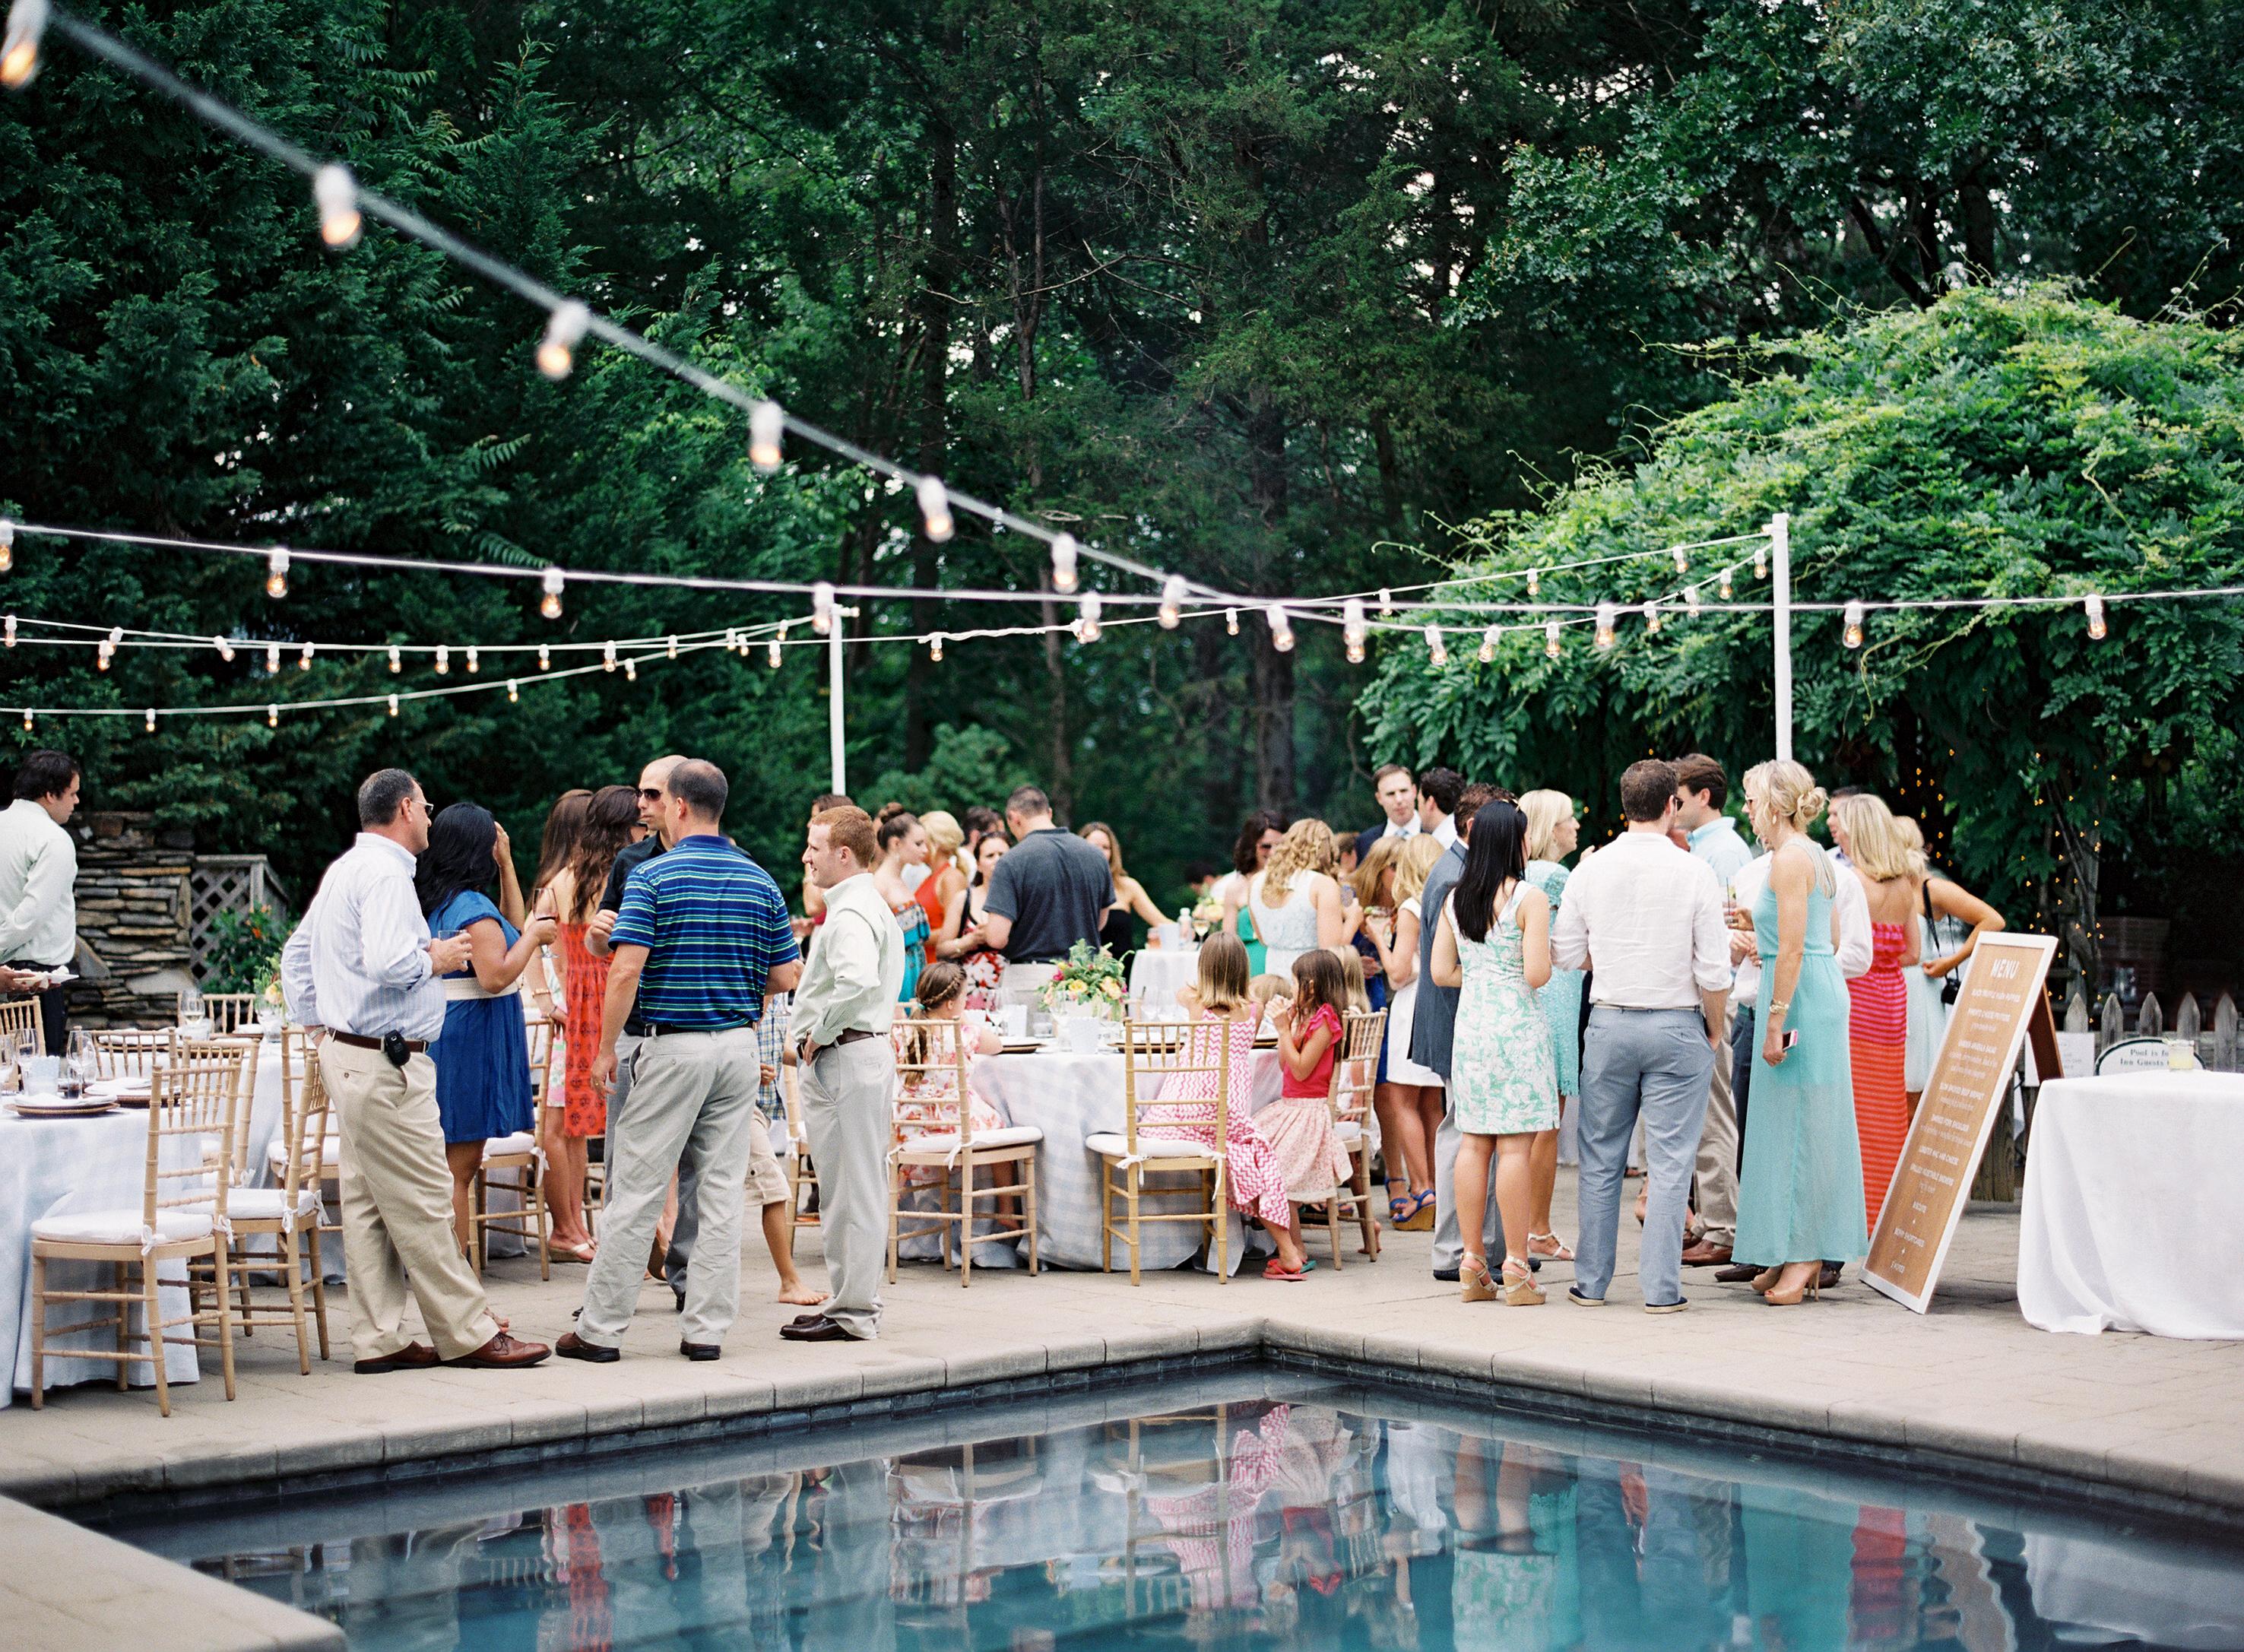 simply-chic-events-bridal-shower-1016.jpg (skyword:345022)